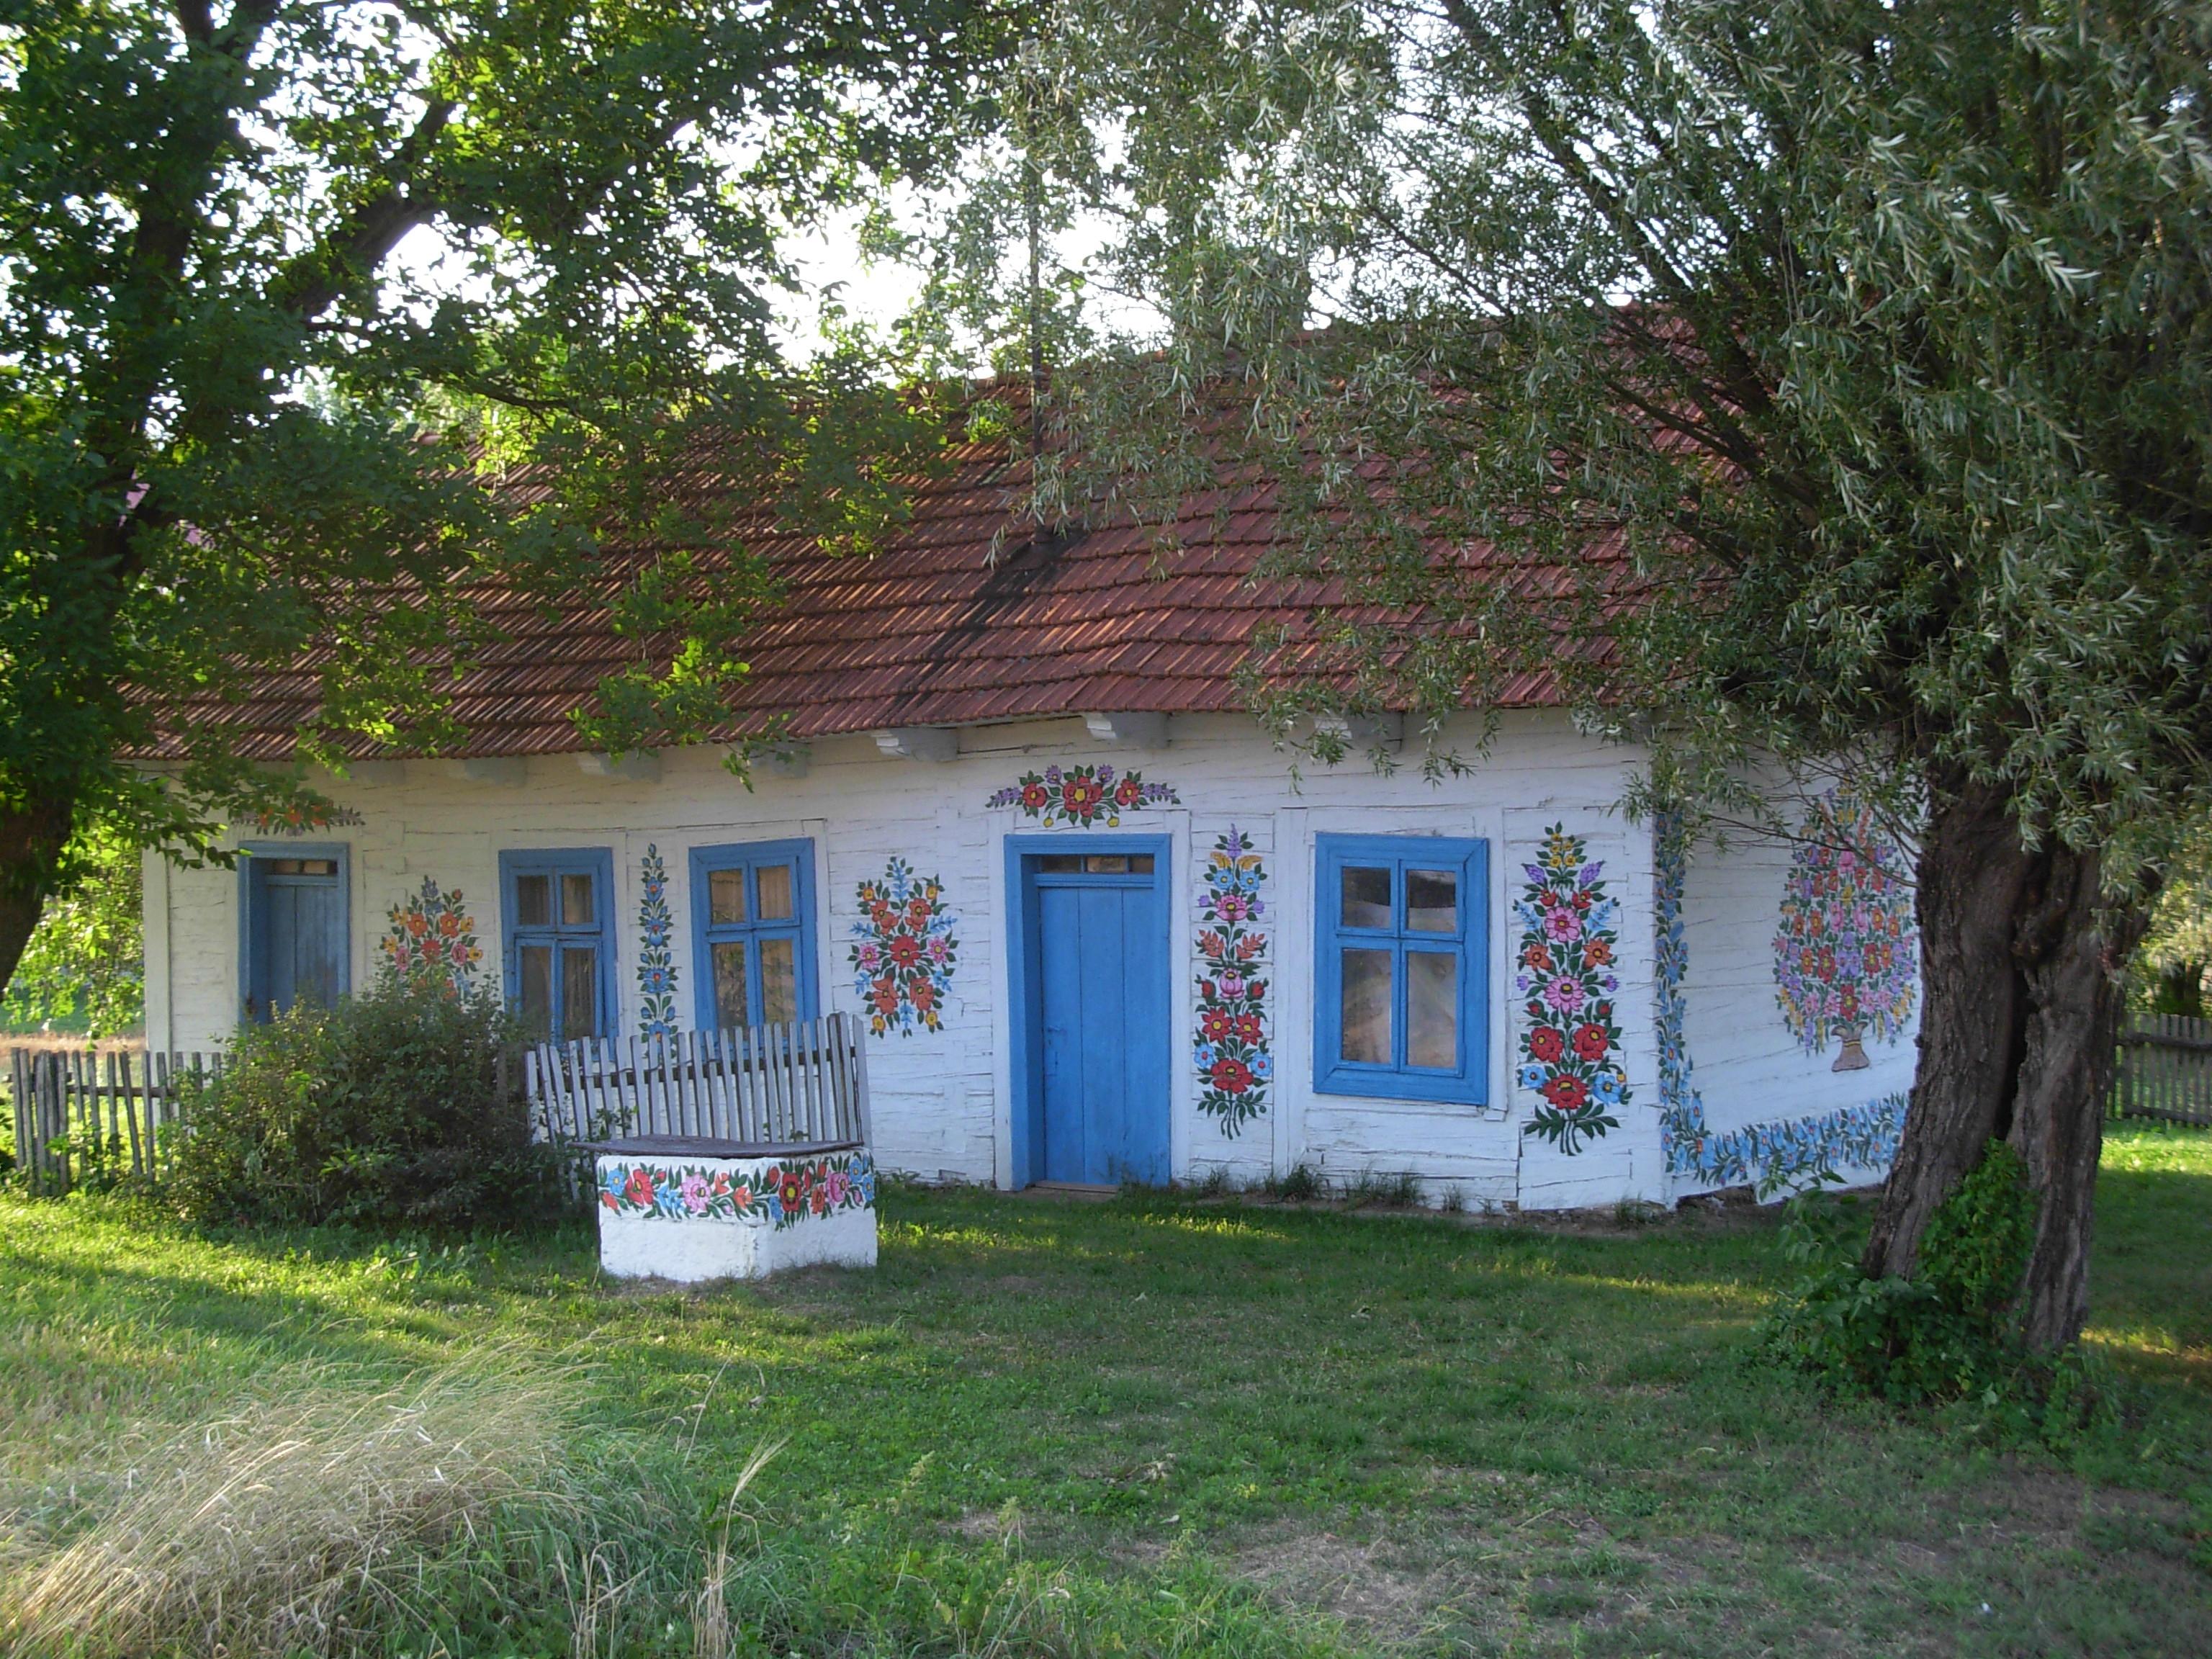 File:Zalipie - painted cottage 04.JPG - Wikimedia Commons Quaint English Cottages